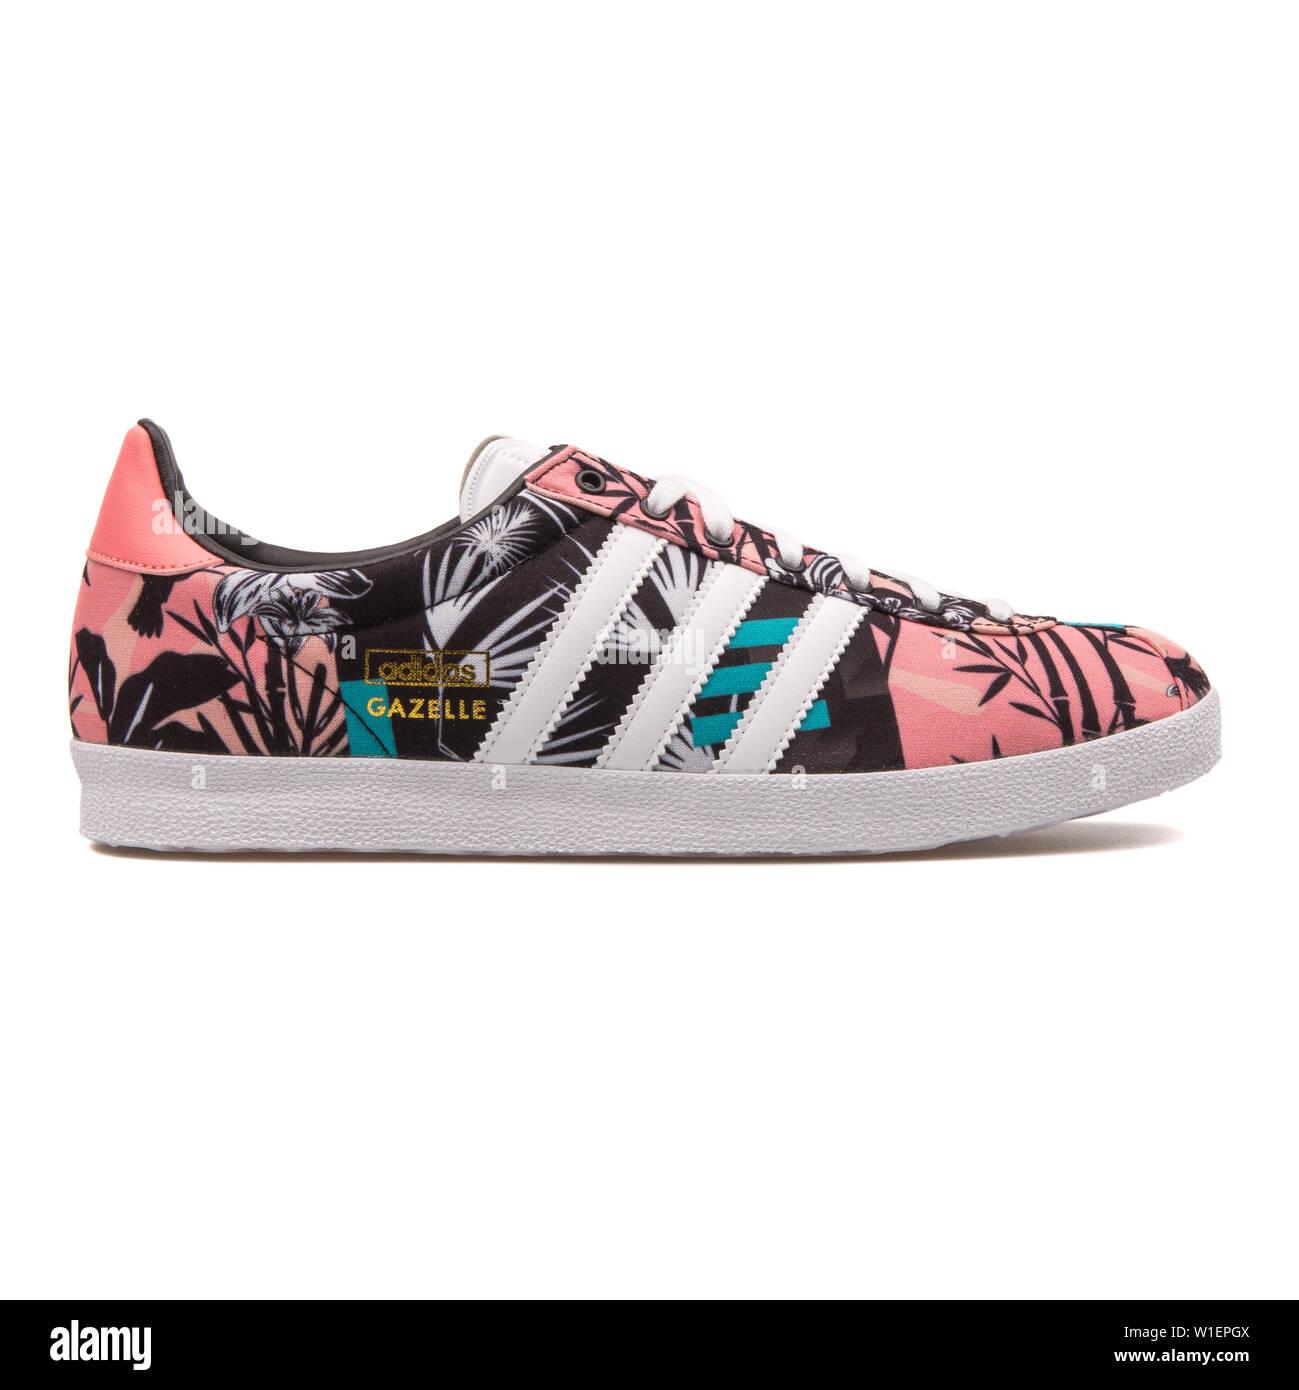 pecho pureza cuenca  VIENNA, AUSTRIA - AUGUST 10, 2017: Adidas Gazelle OG multi color sneaker on  white background Stock Photo - Alamy